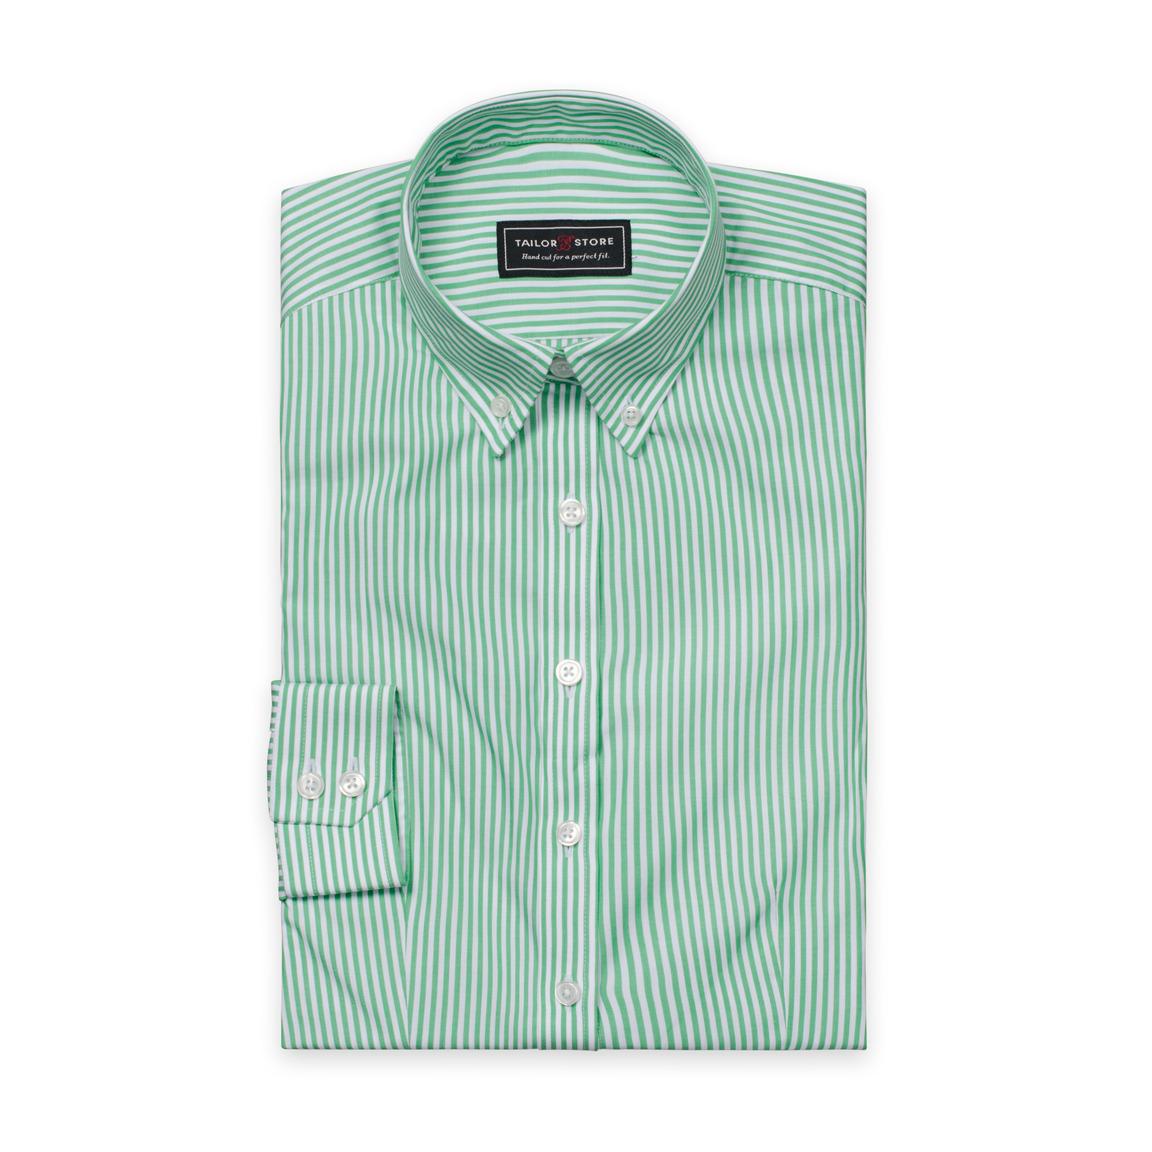 White Green Striped Poplin Shirt